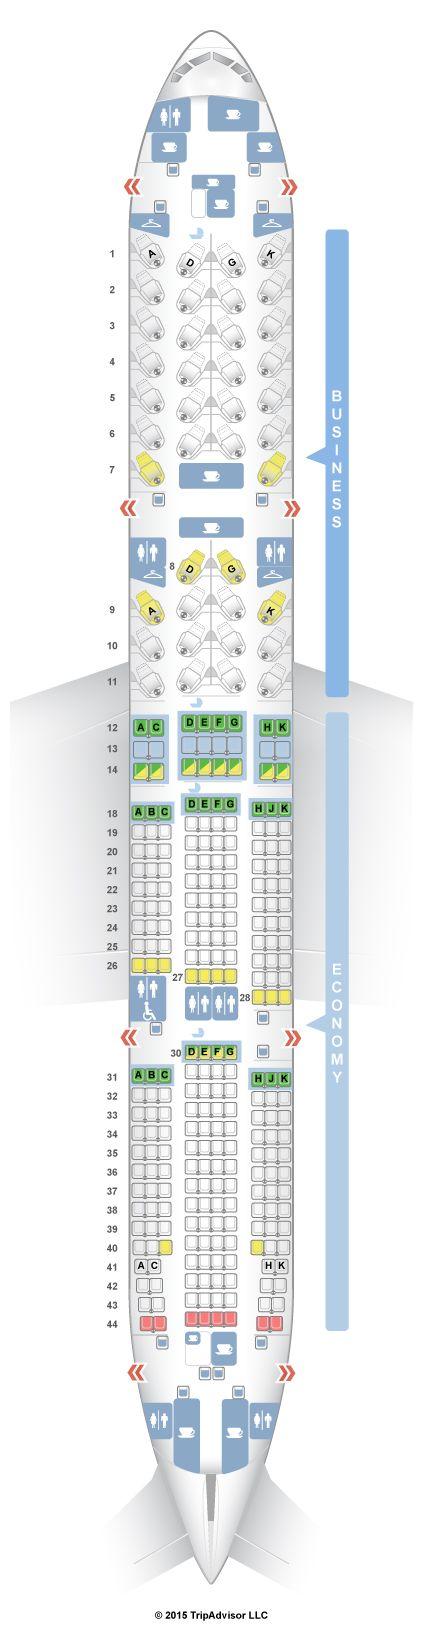 SeatGuru Seat Map Air Canada Boeing 777-200LR (77L) Two Class V2